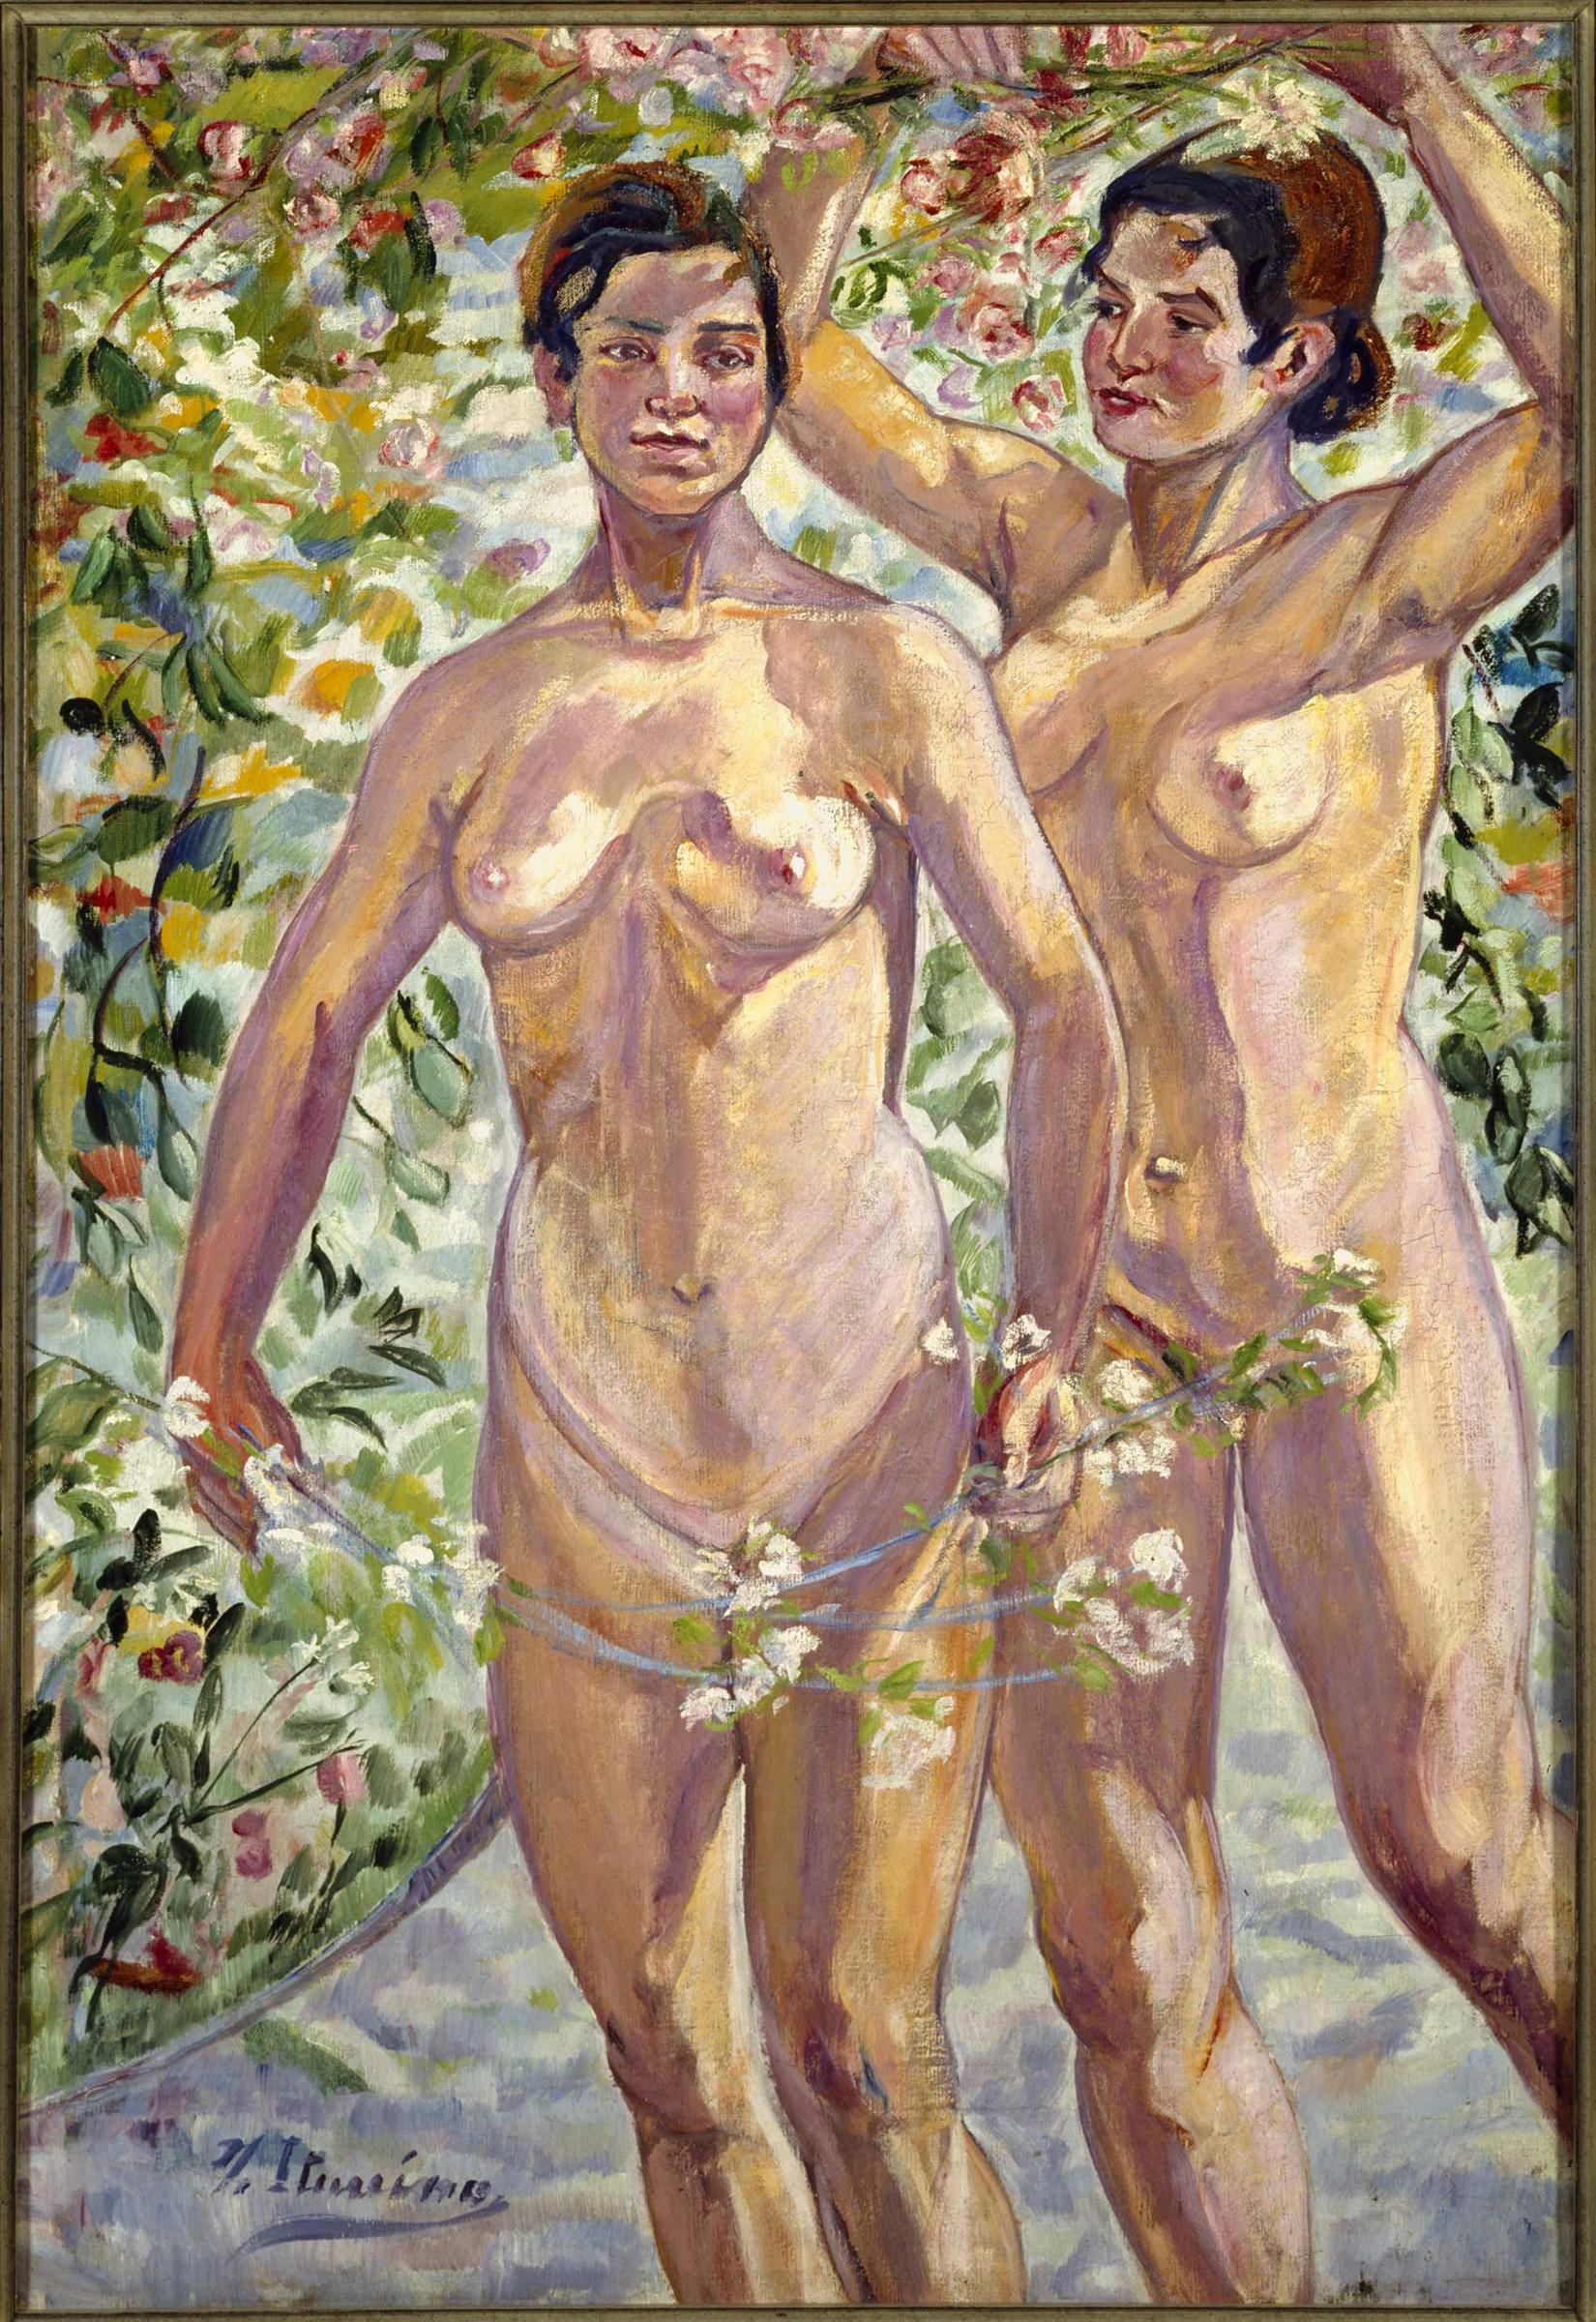 """Muchahas con flores"", de Francisco Iturrino. (www.museoreinasofia.es)"